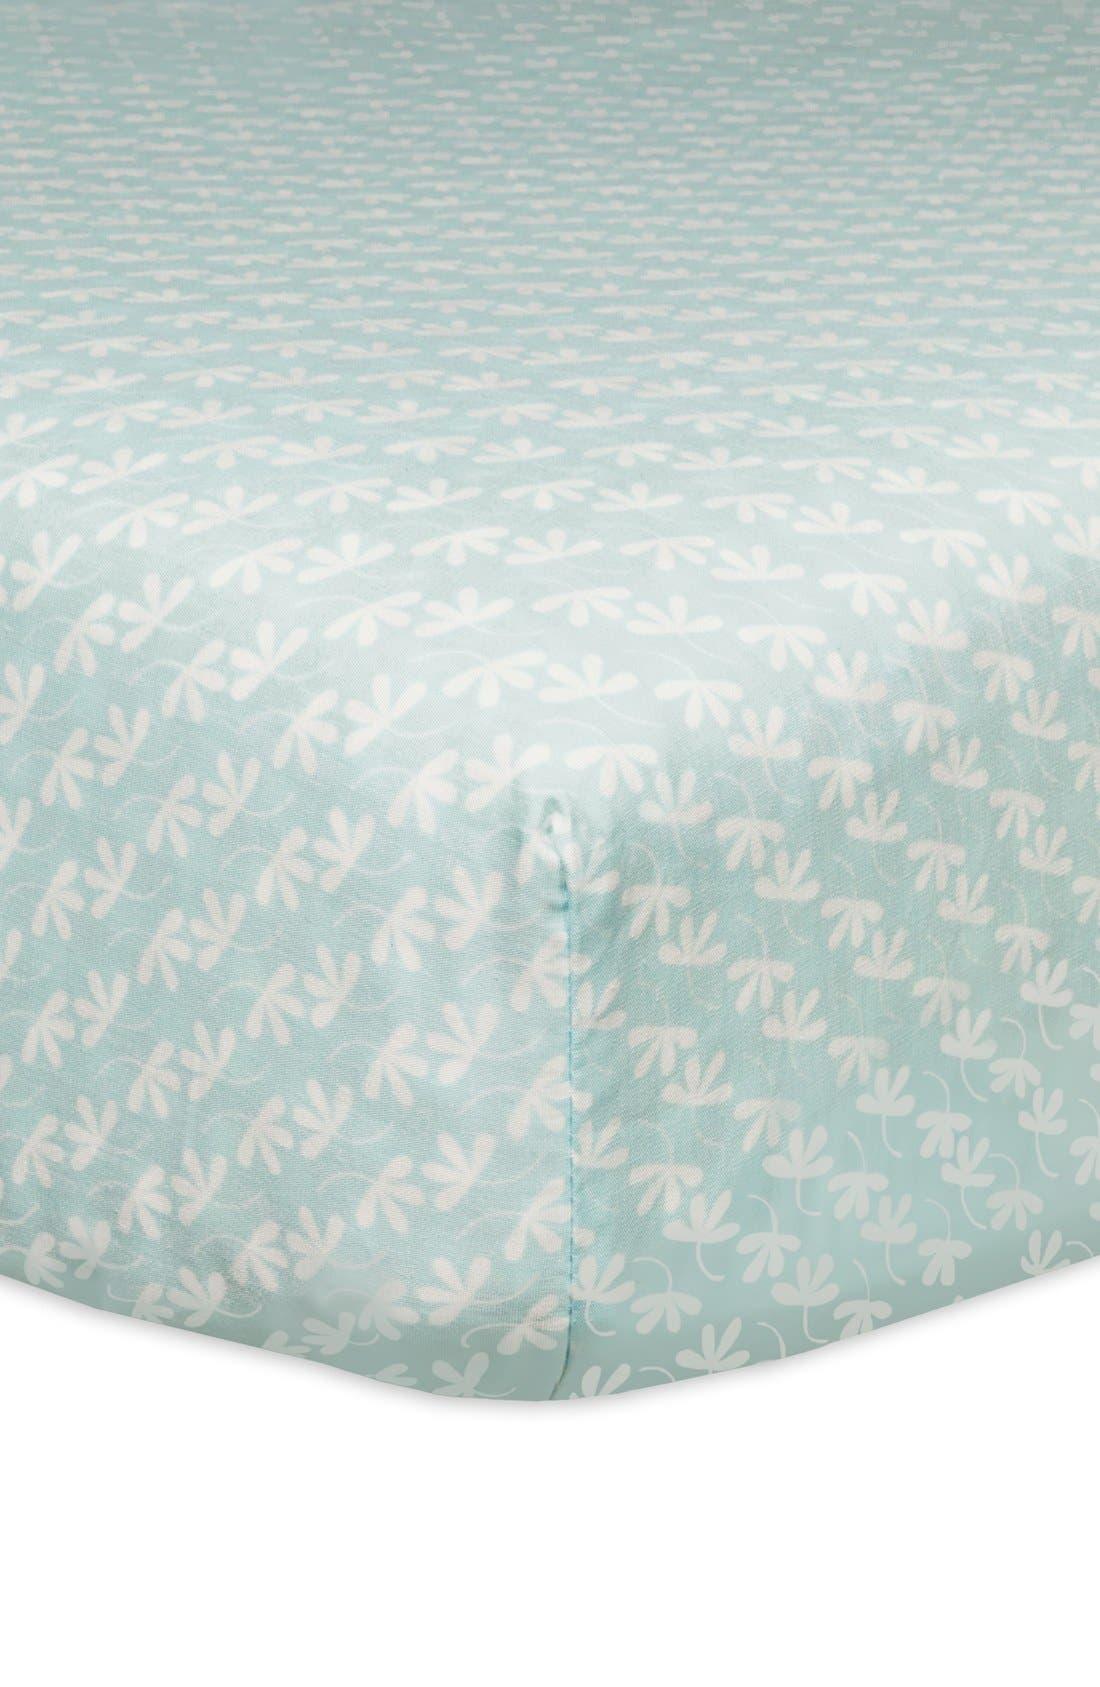 'Flora' Crib Sheet, Crib Skirt, Contour Changing Pad, Play Blanket, Stroller Blanket & Wall Decals,                             Alternate thumbnail 2, color,                             400